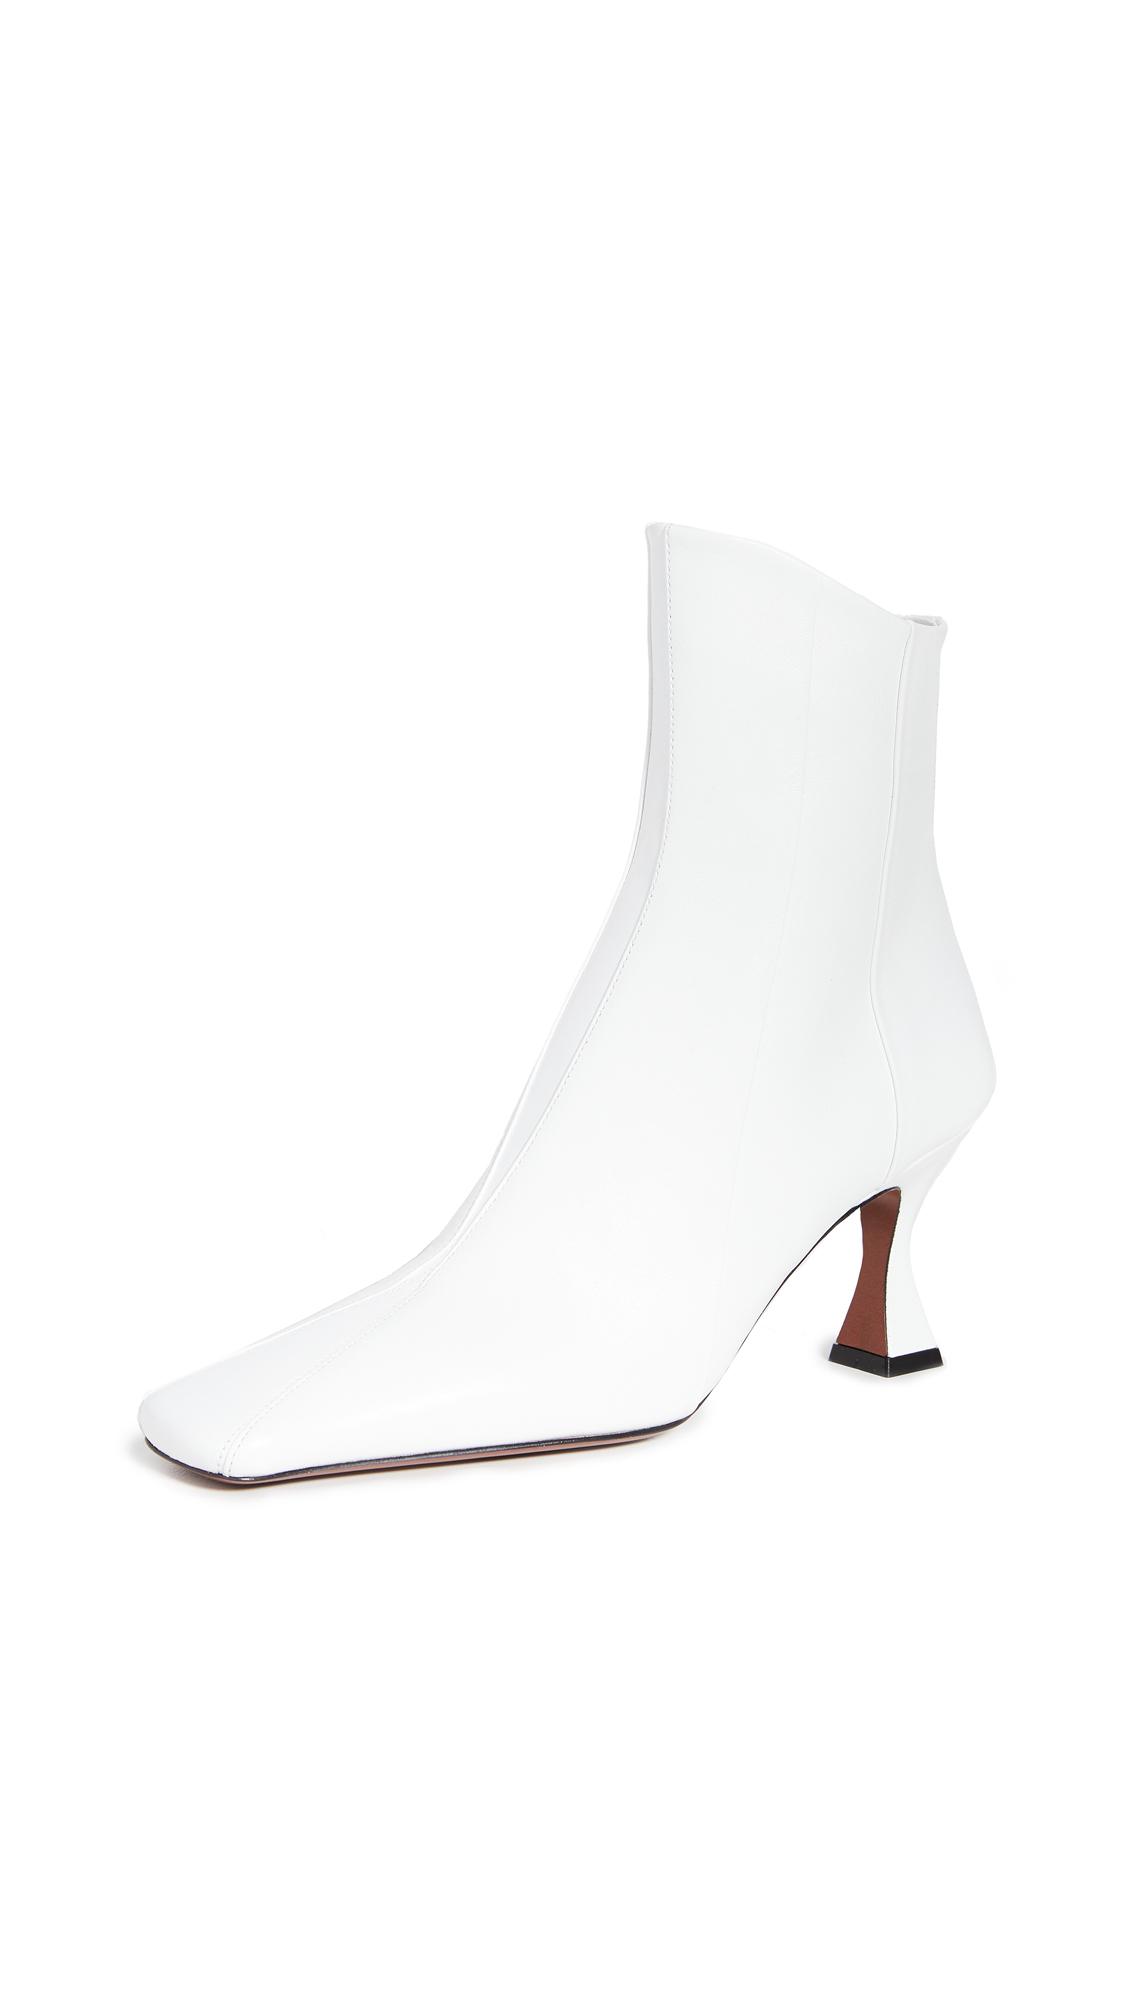 MANU Atelier Multi Panel XX Duck Boots - 30% Off Sale